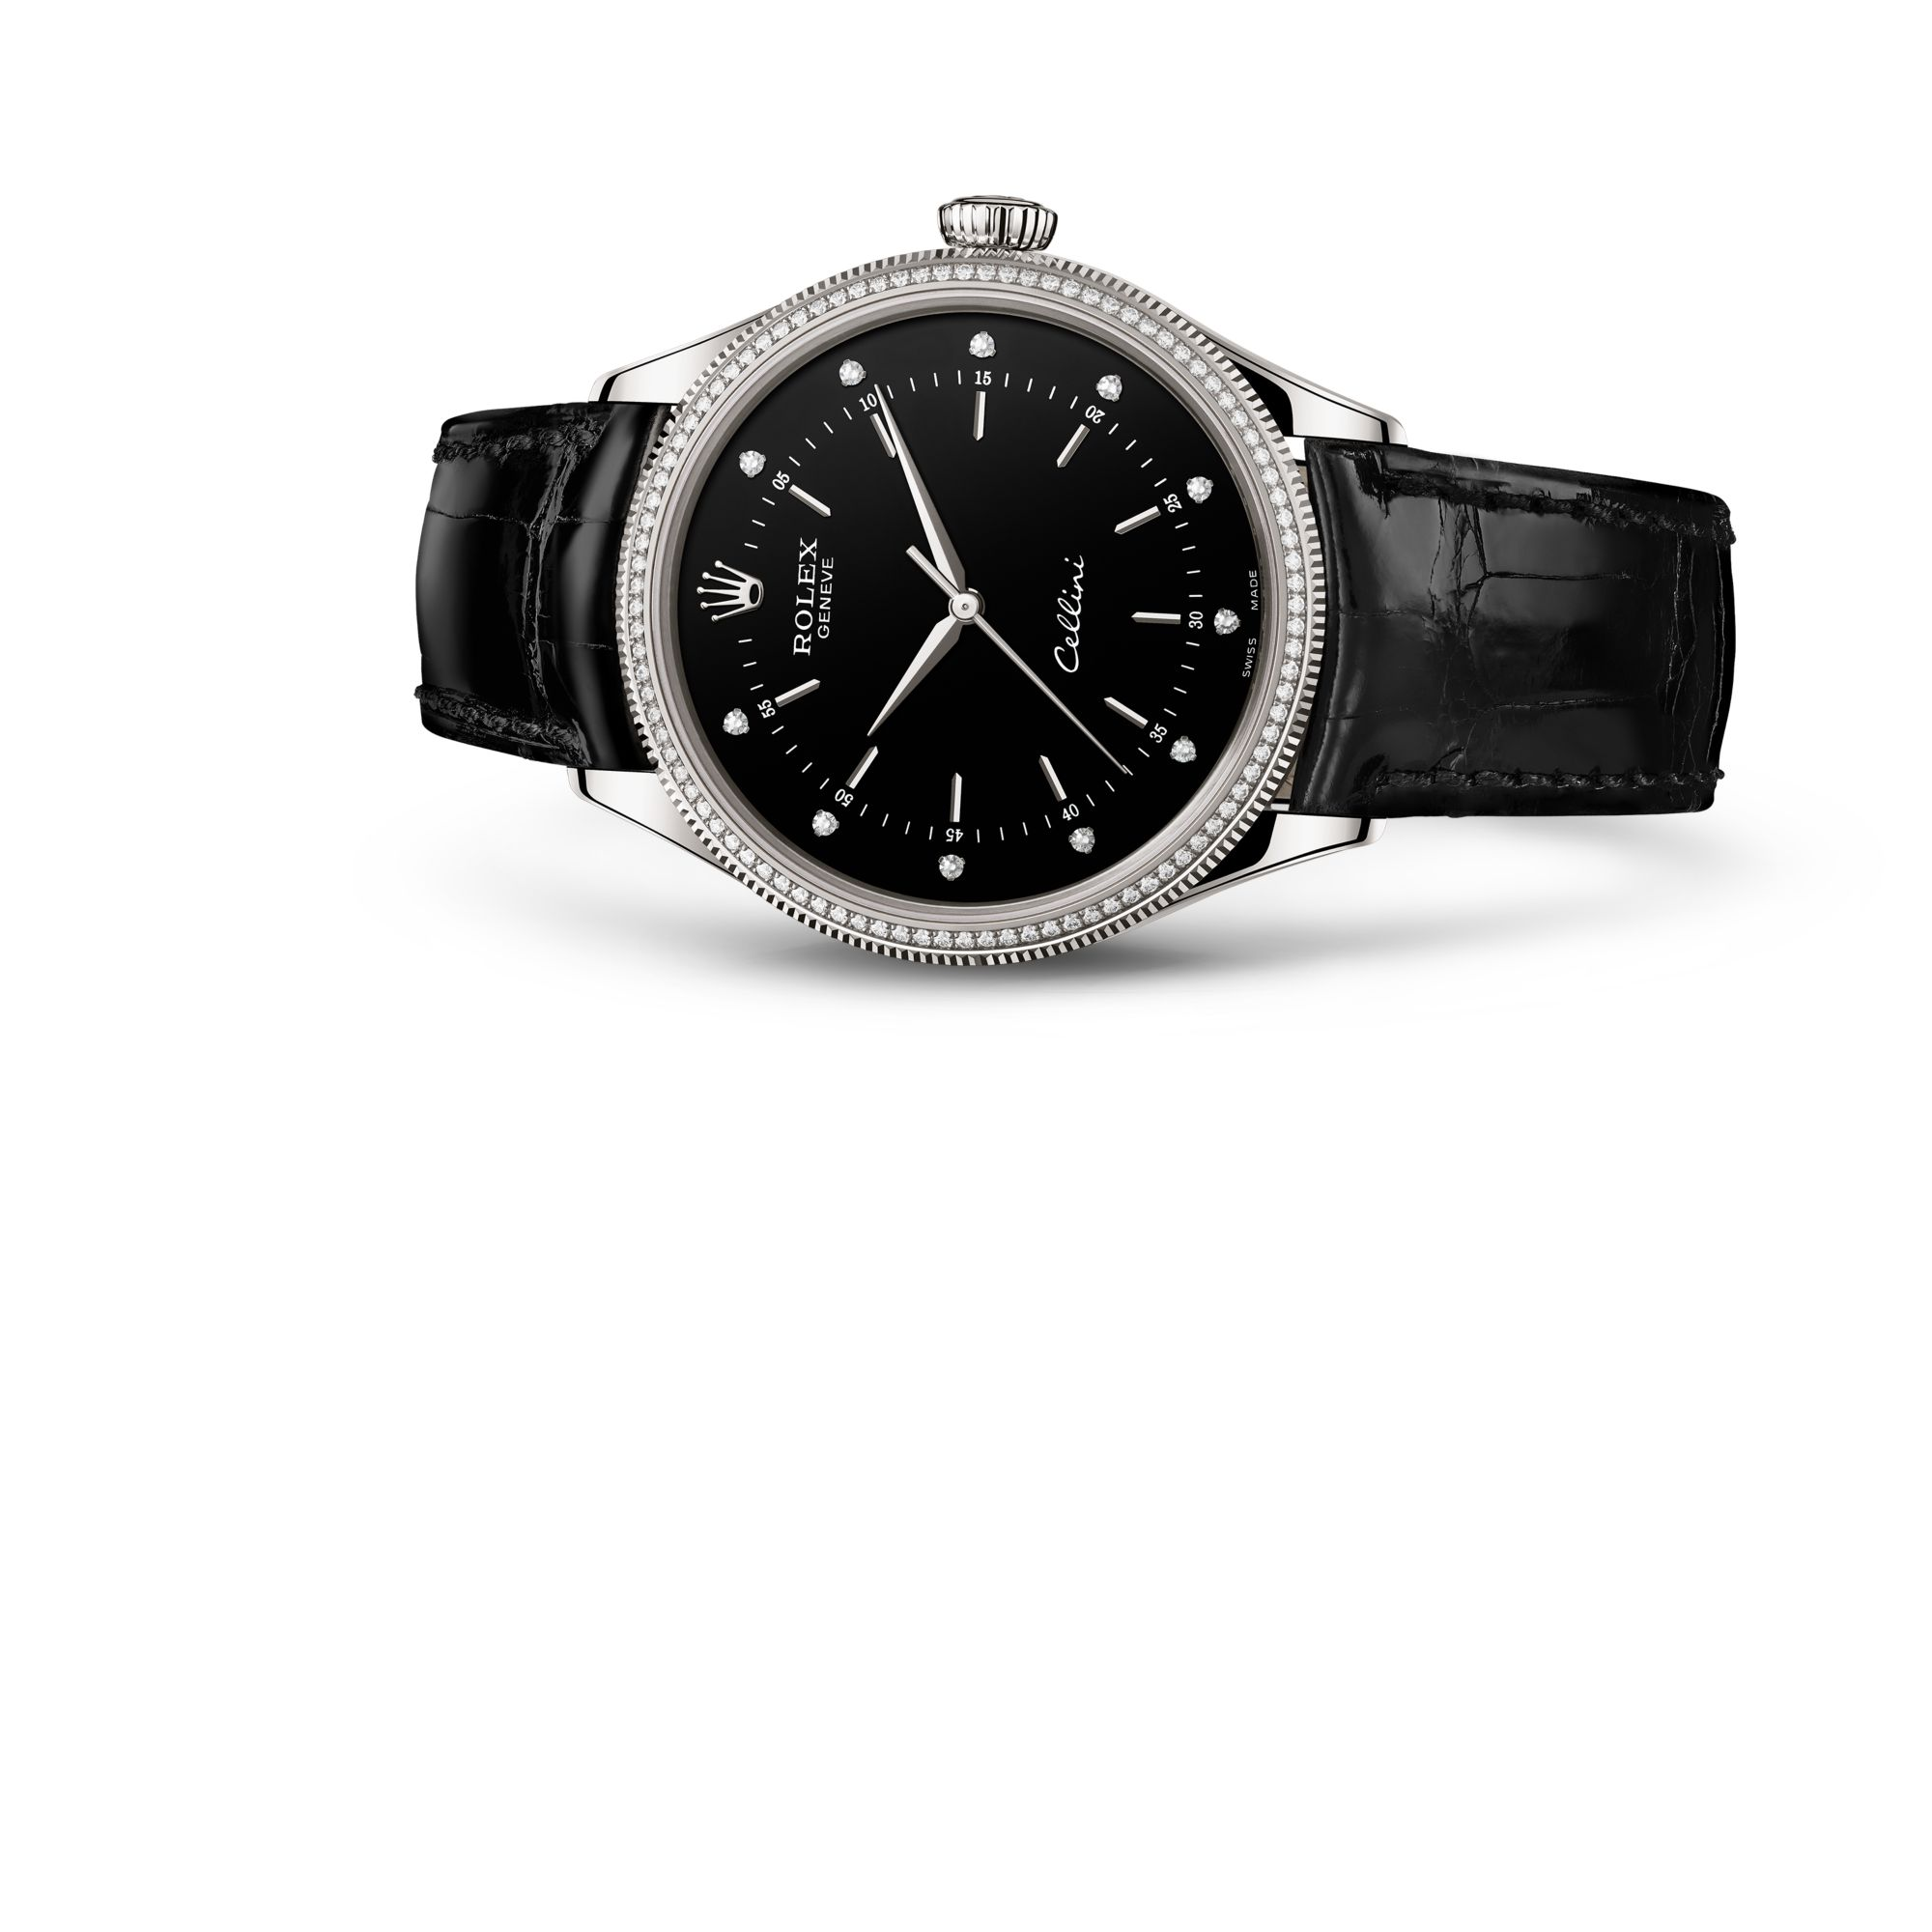 Rolex チェリーニ タイム M50609RBR-0007